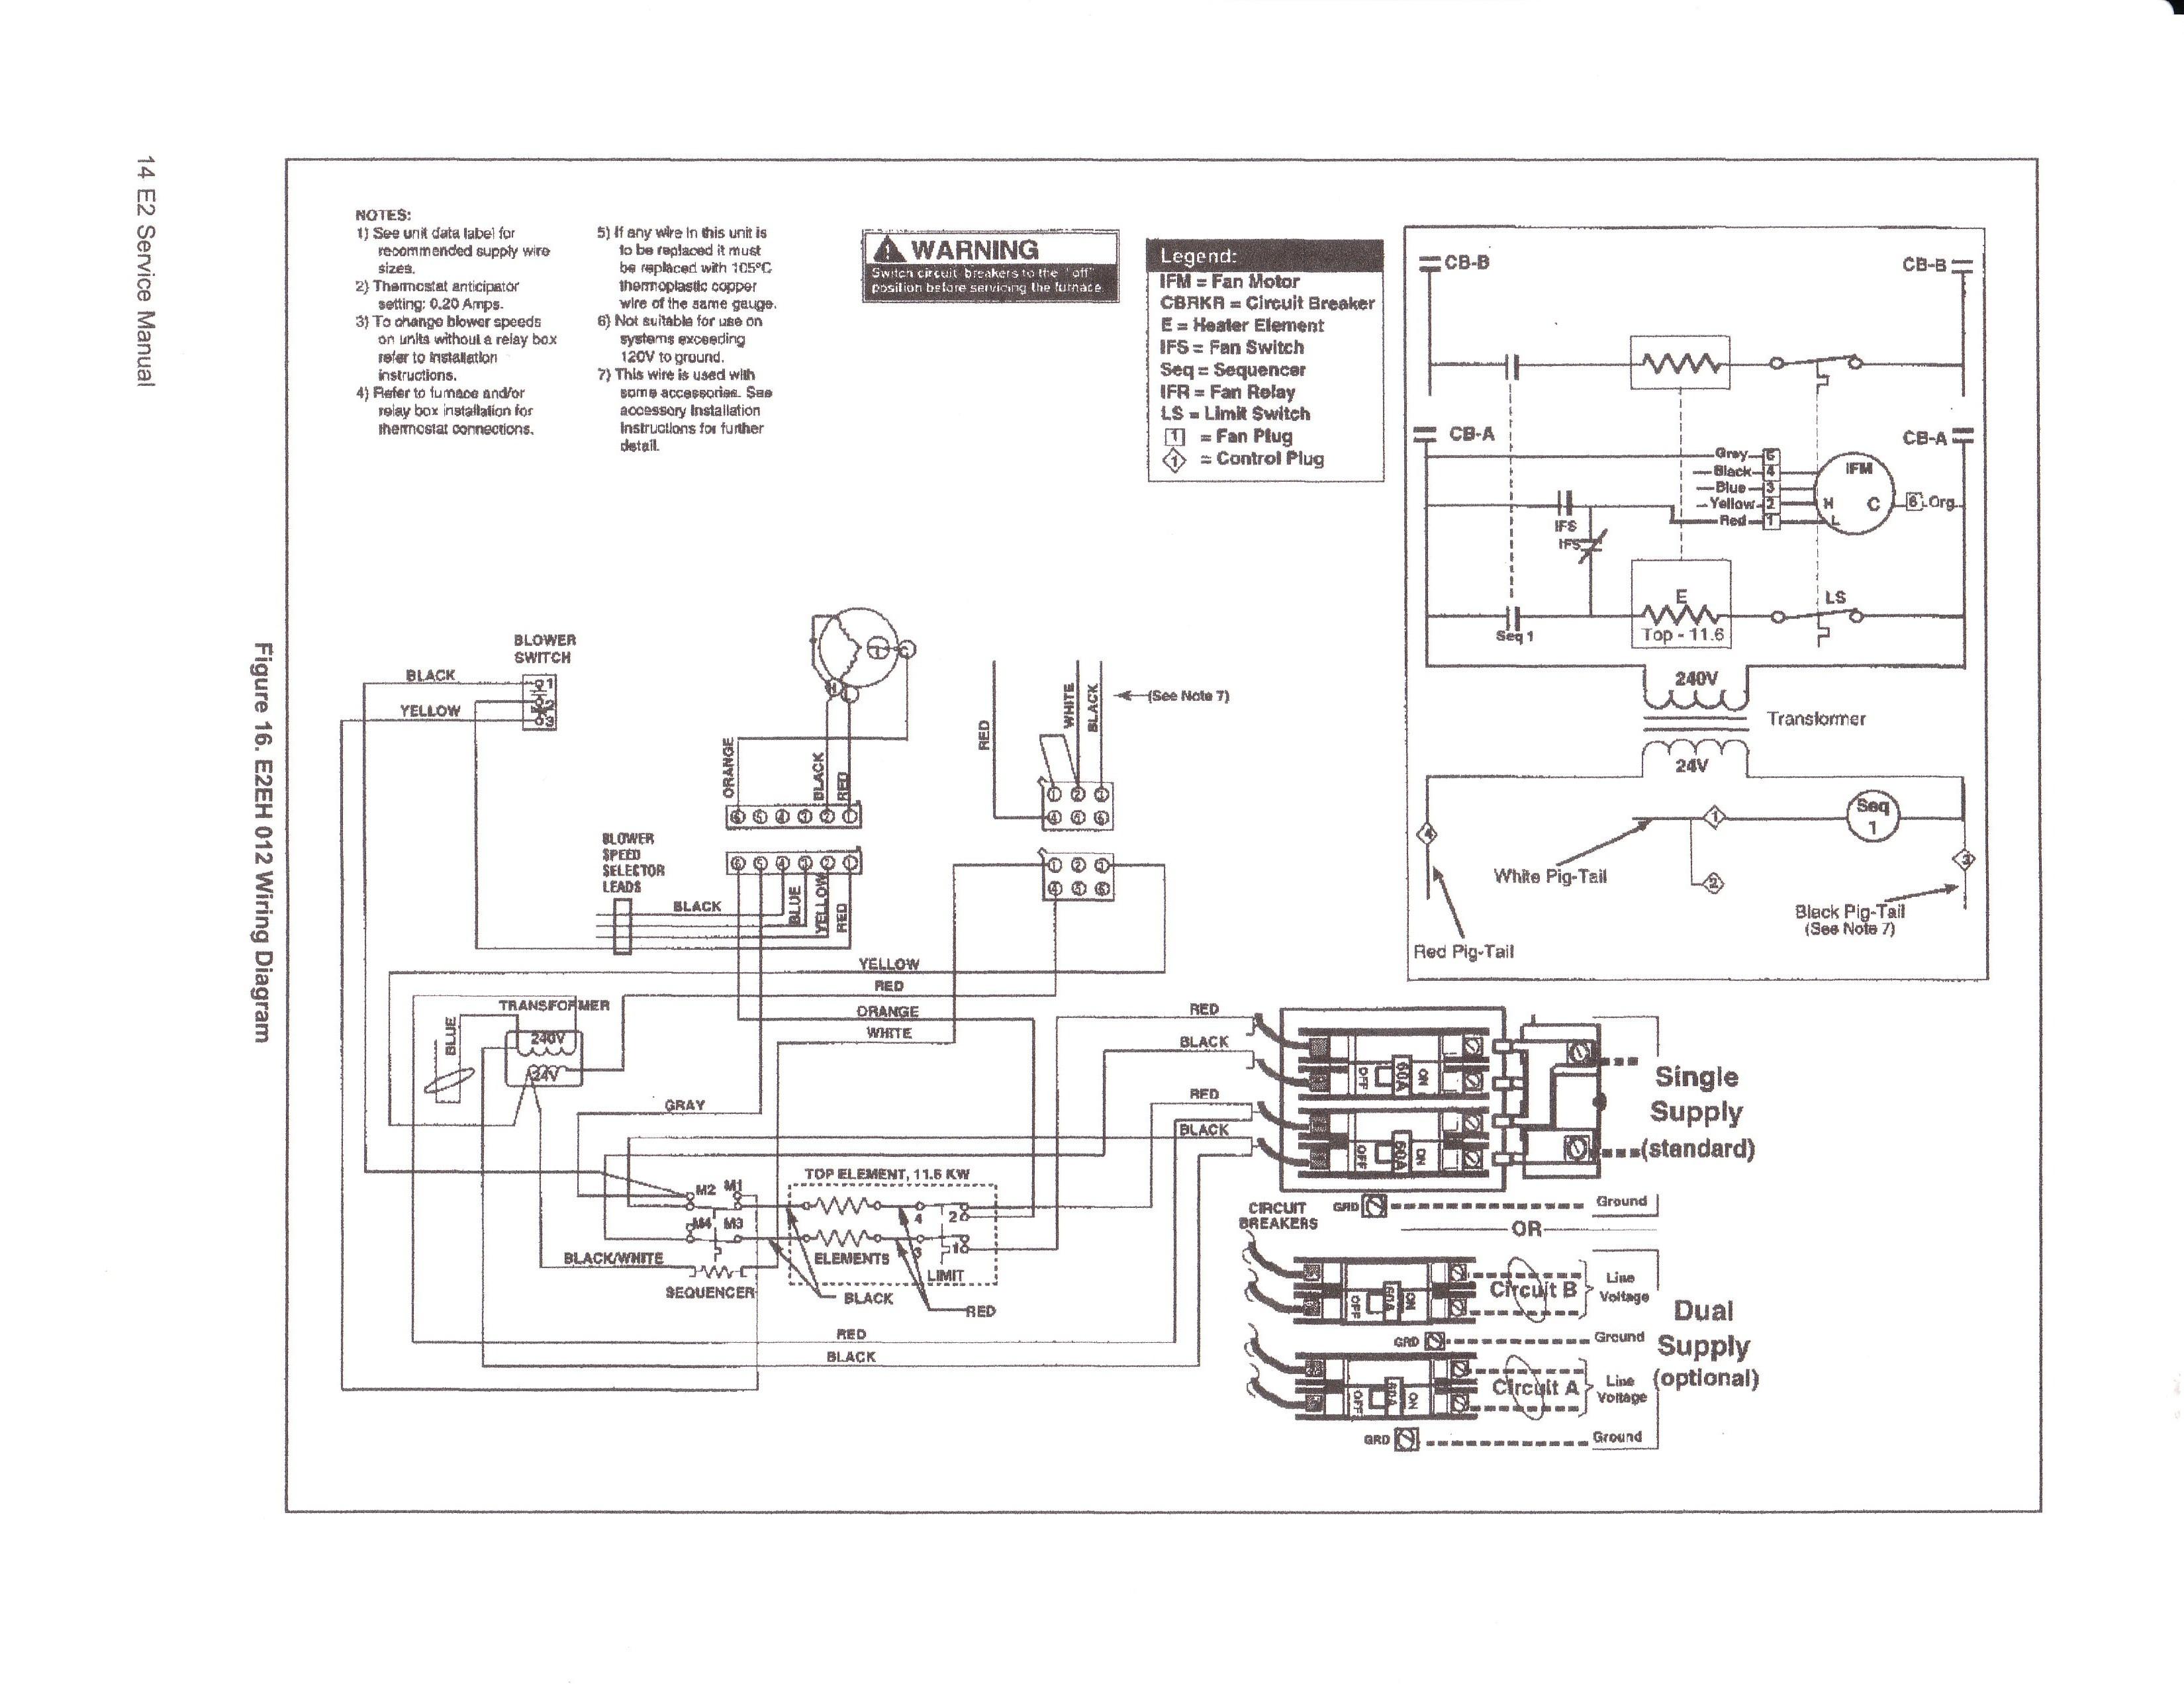 miller furnace wiring diagram wiring diagram rh bayareatechnology org miller electric furnace wiring diagram Mobile Home Furnace Wiring Diagram